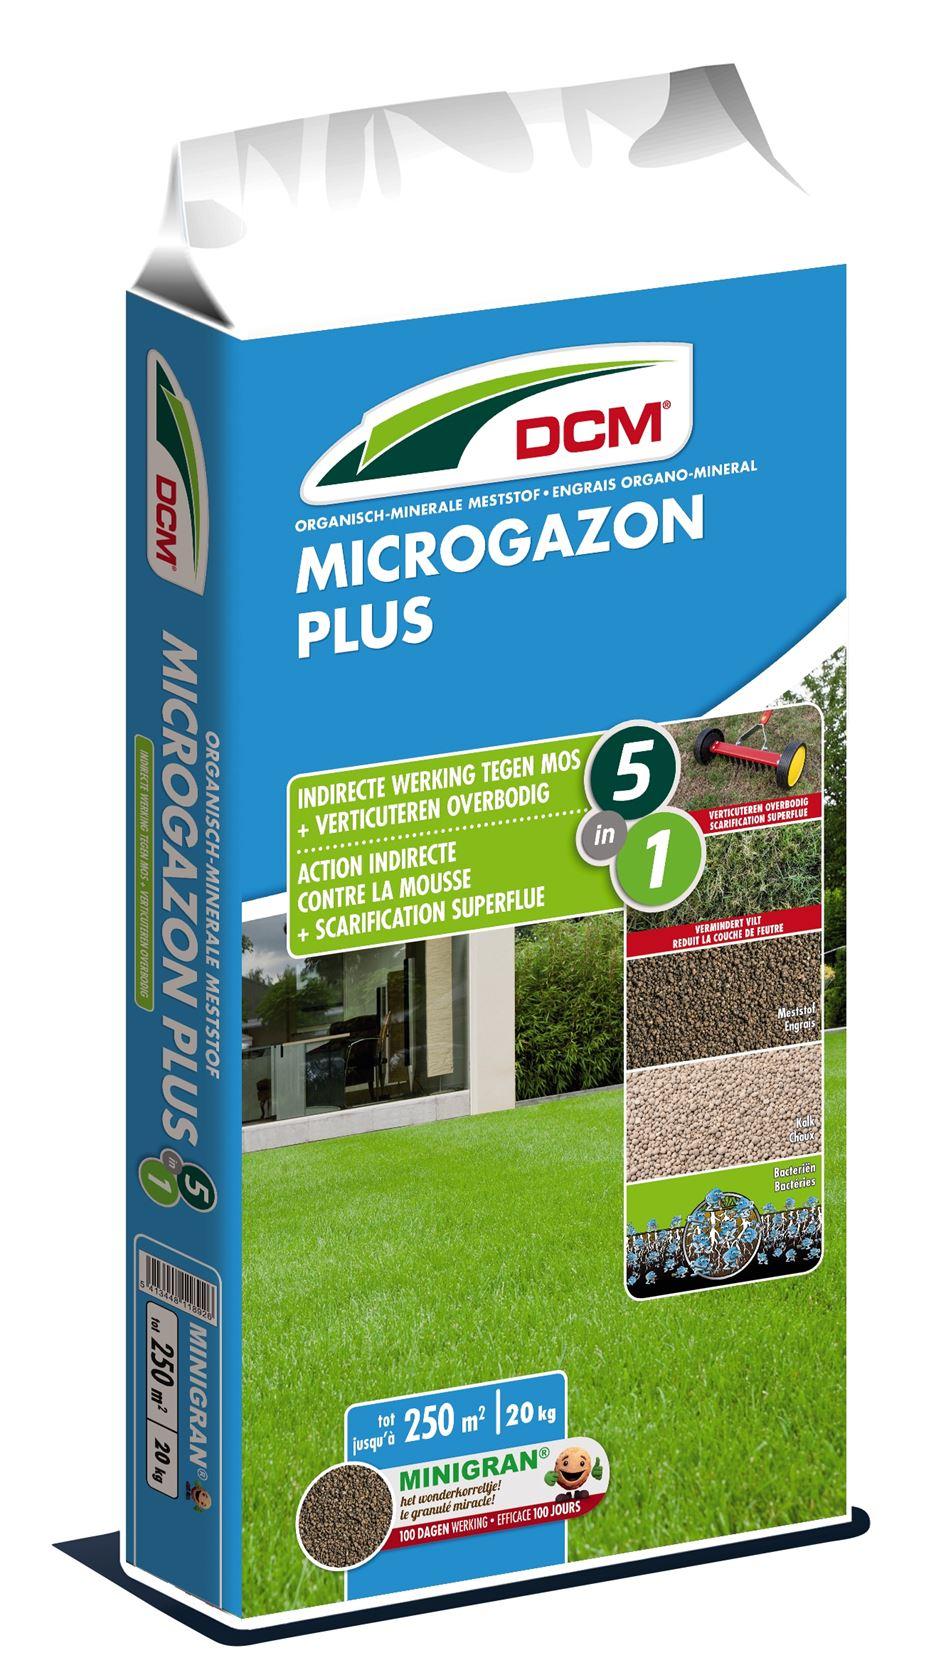 Gazonmeststof-microgazon-plus-20kg-5in1-NPK-7-4-17-8Ca-3MgO-Bacillus-sp-